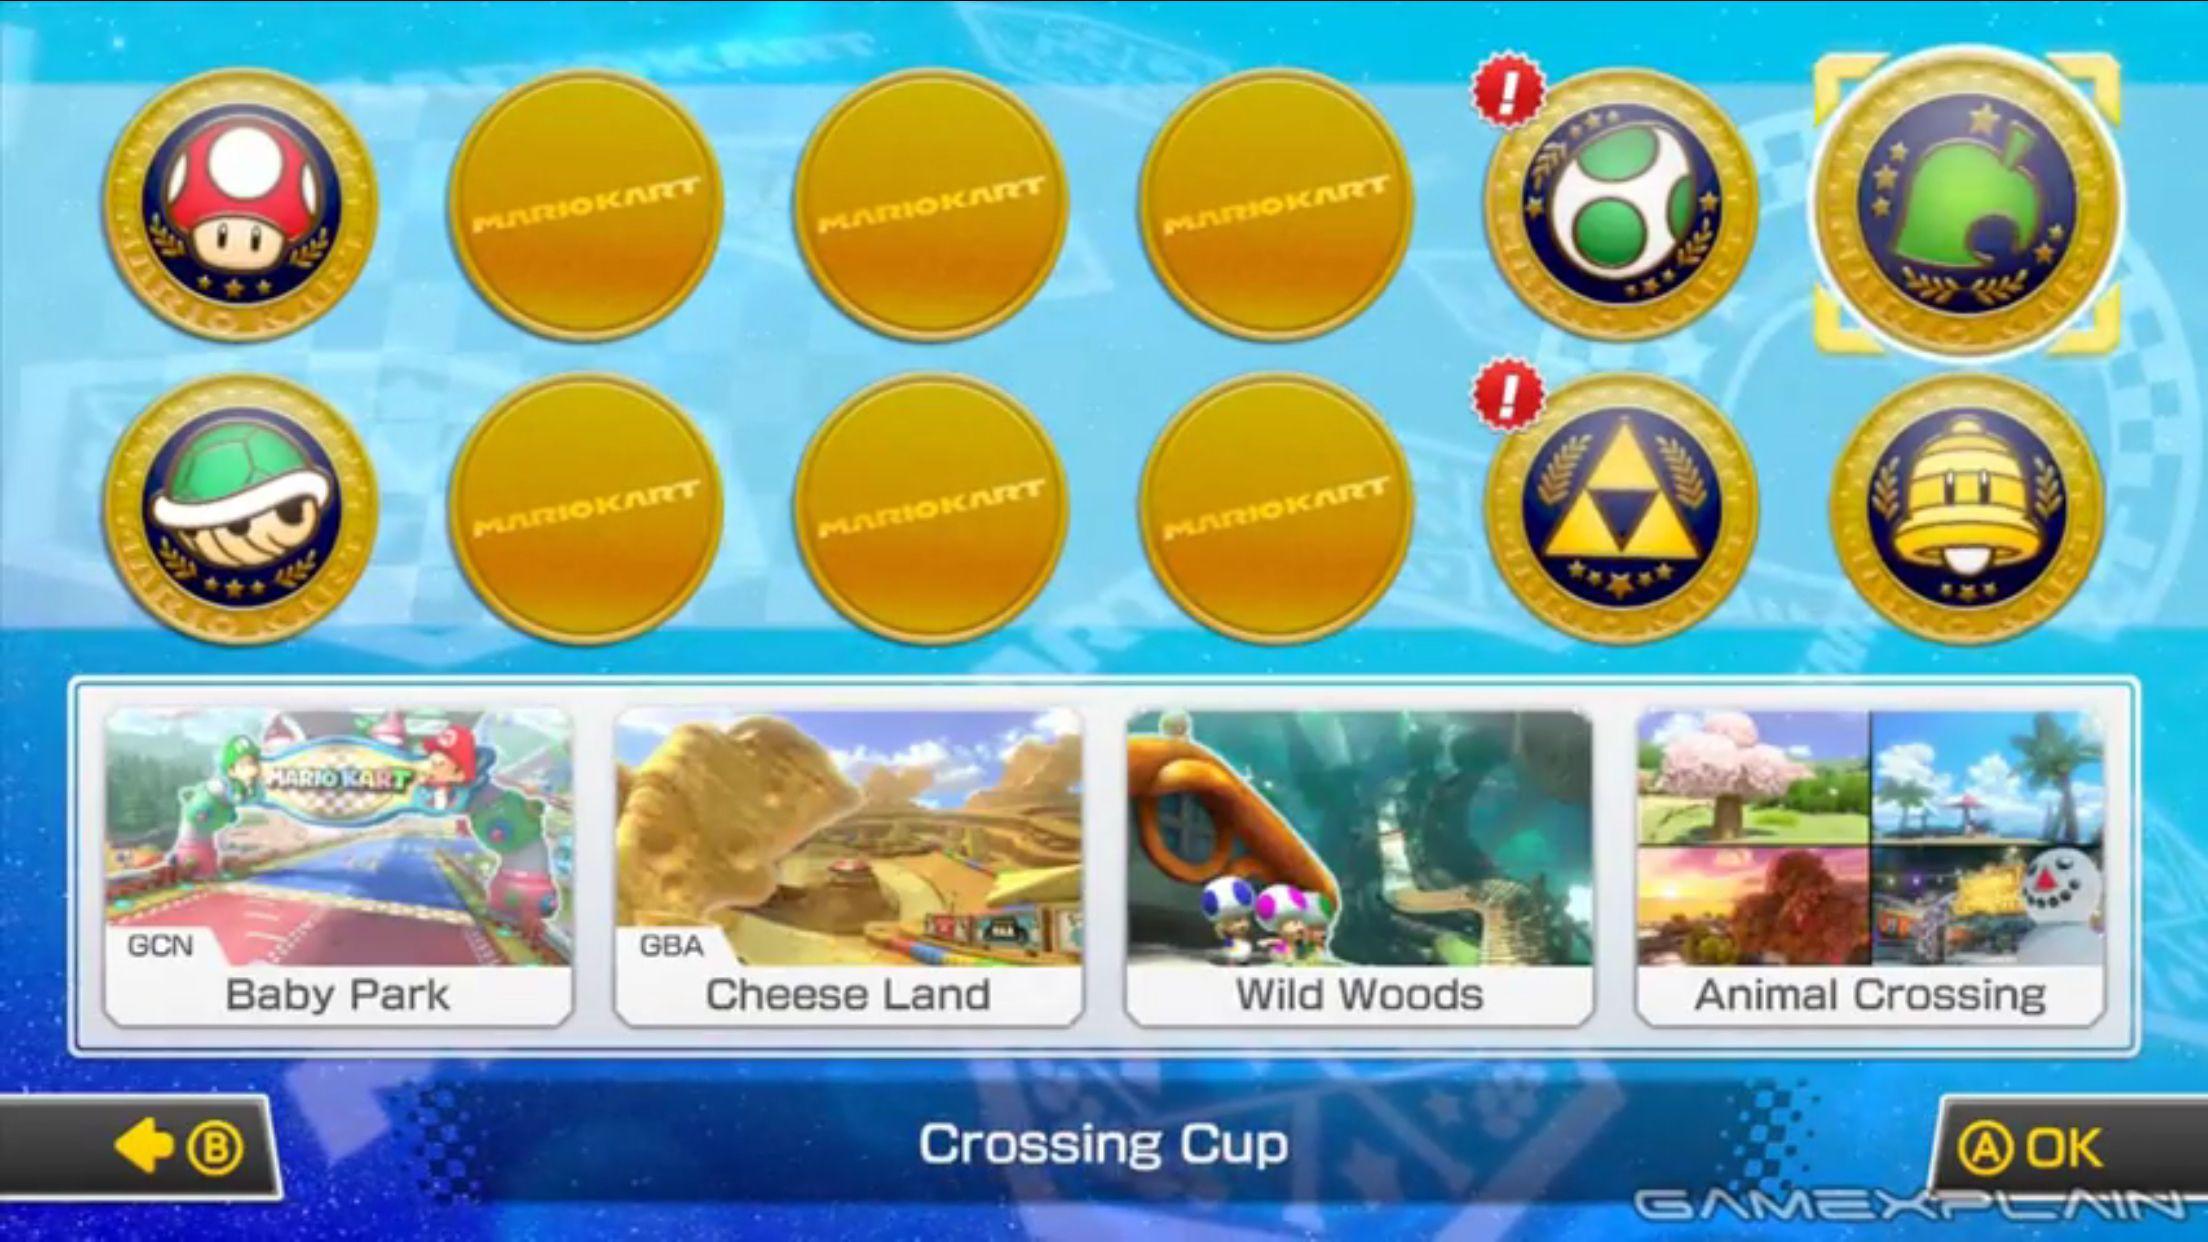 Mario Kart 8 Dlc Crossing Cup Mario Kart 8 Mario Kart Baby Park